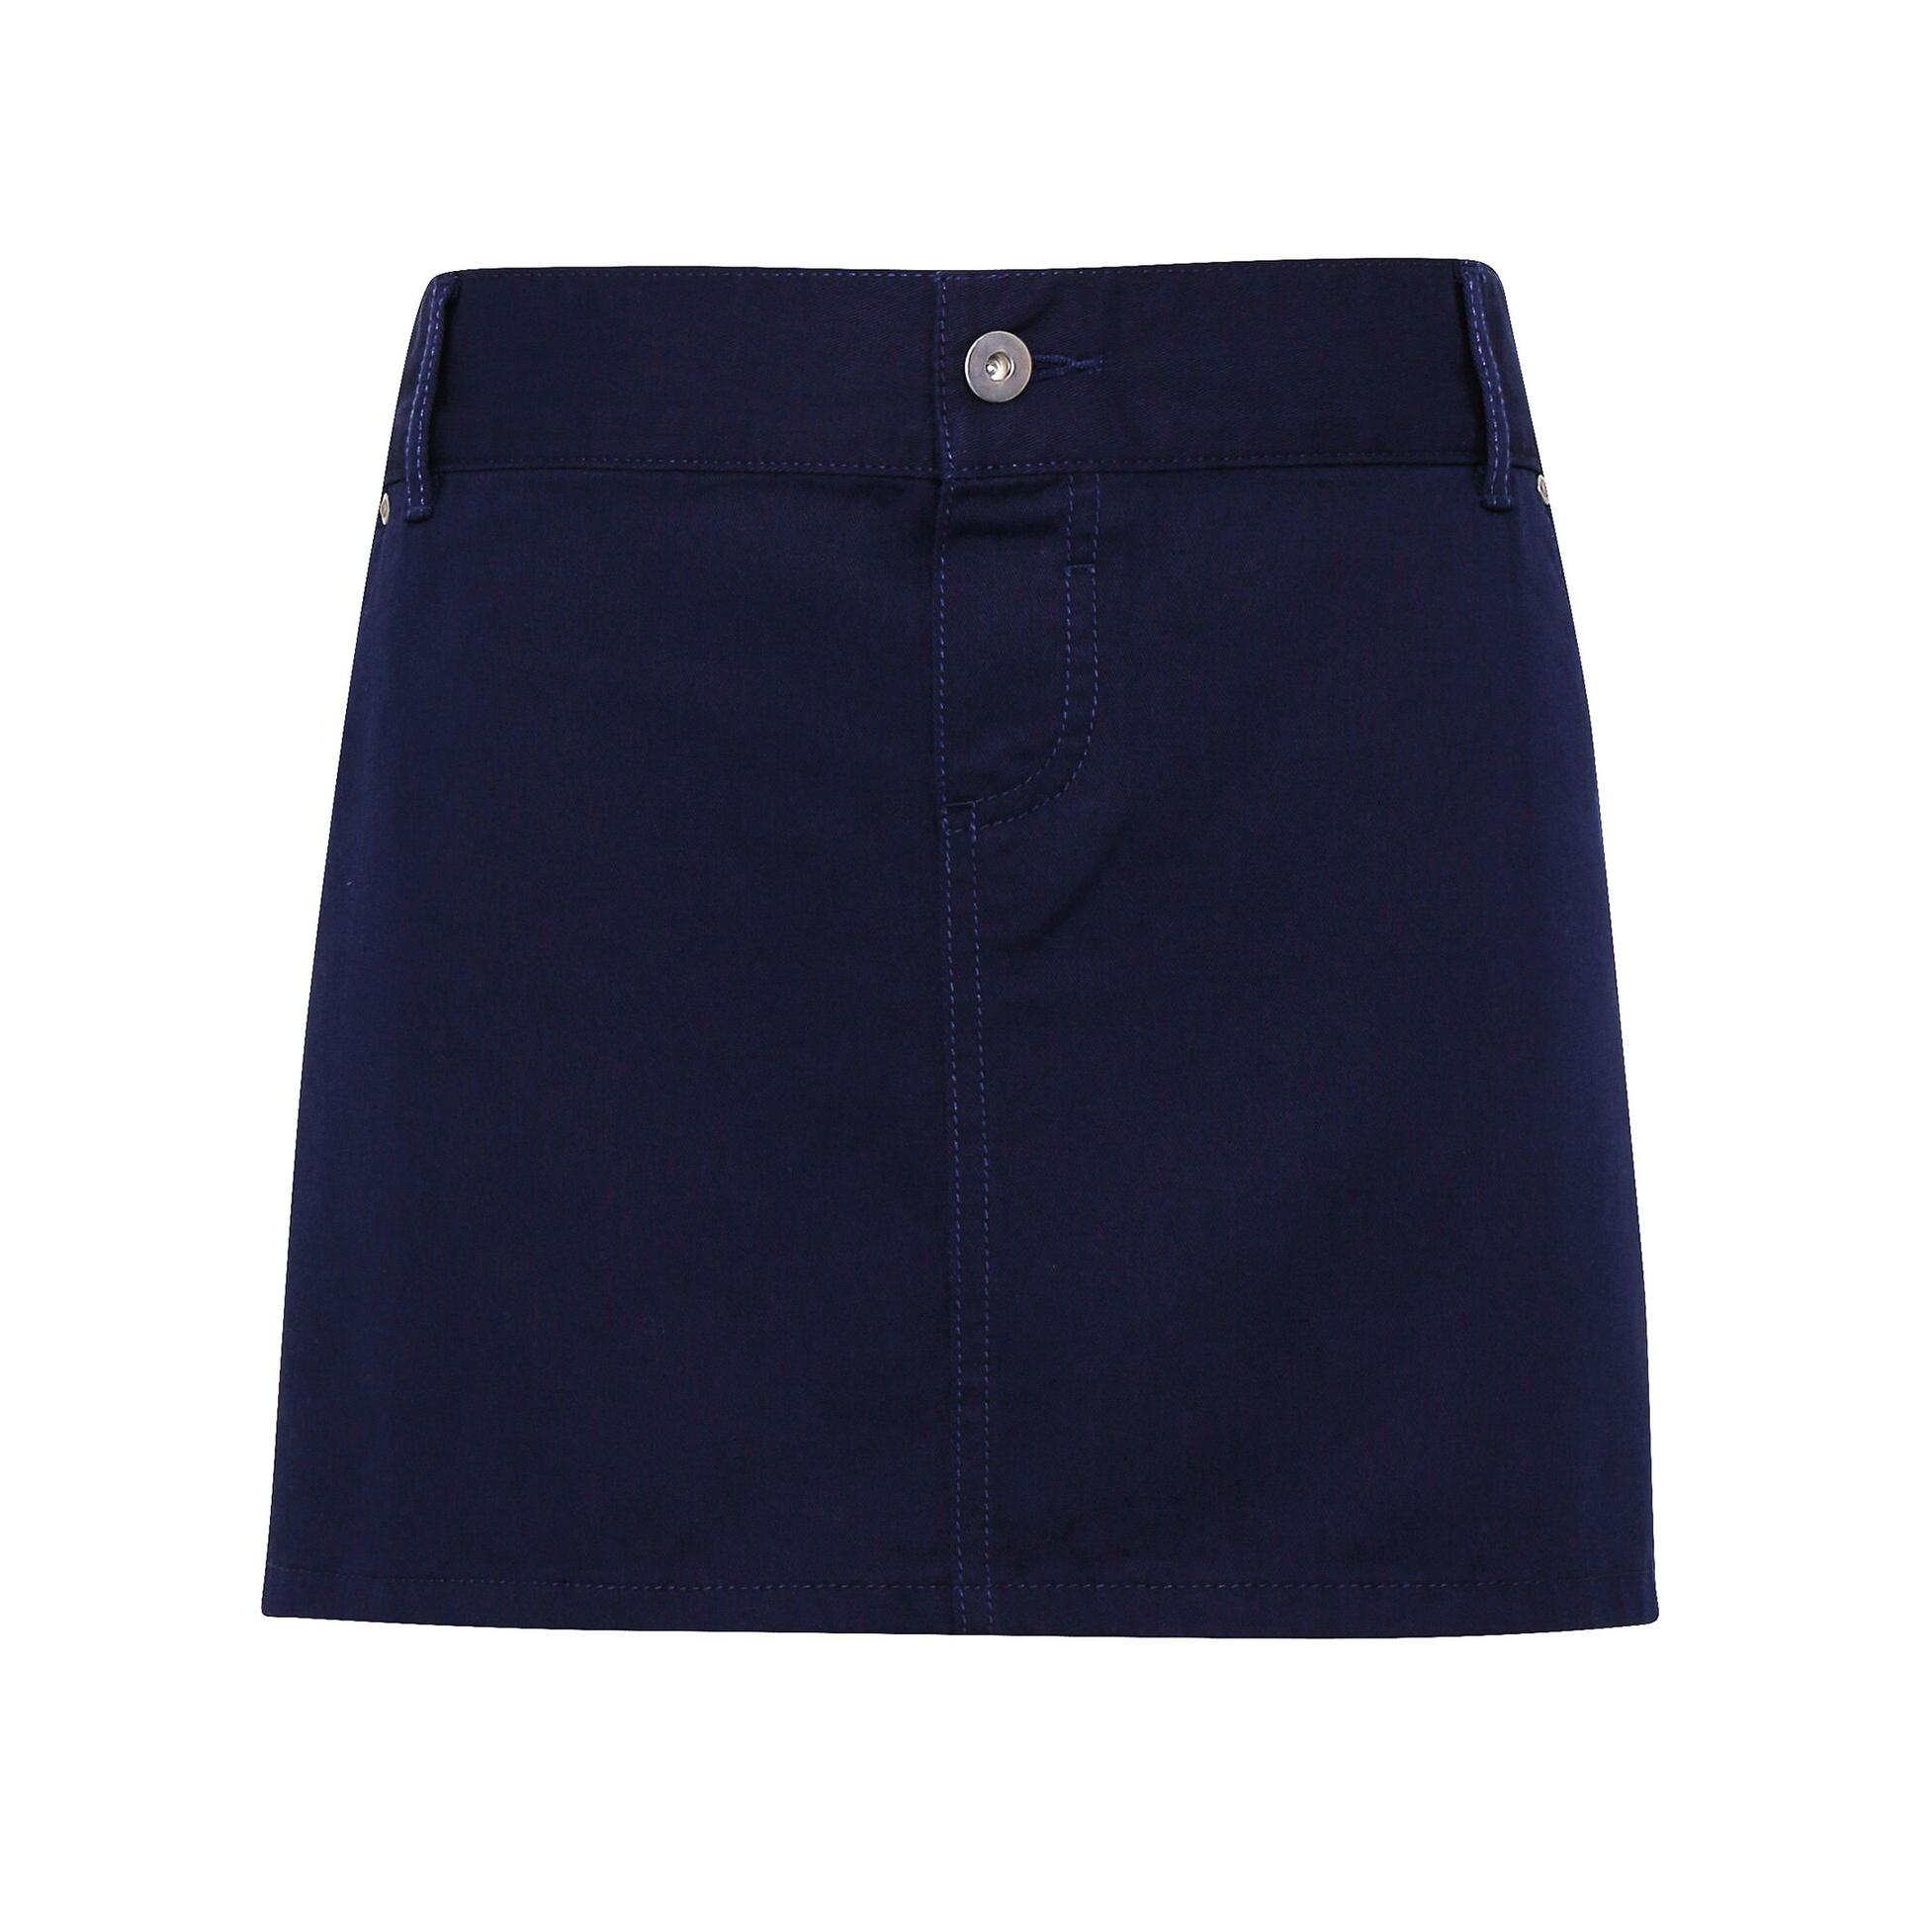 Premier-Unisex-Chino-Cotton-Waist-Apron-RW6172